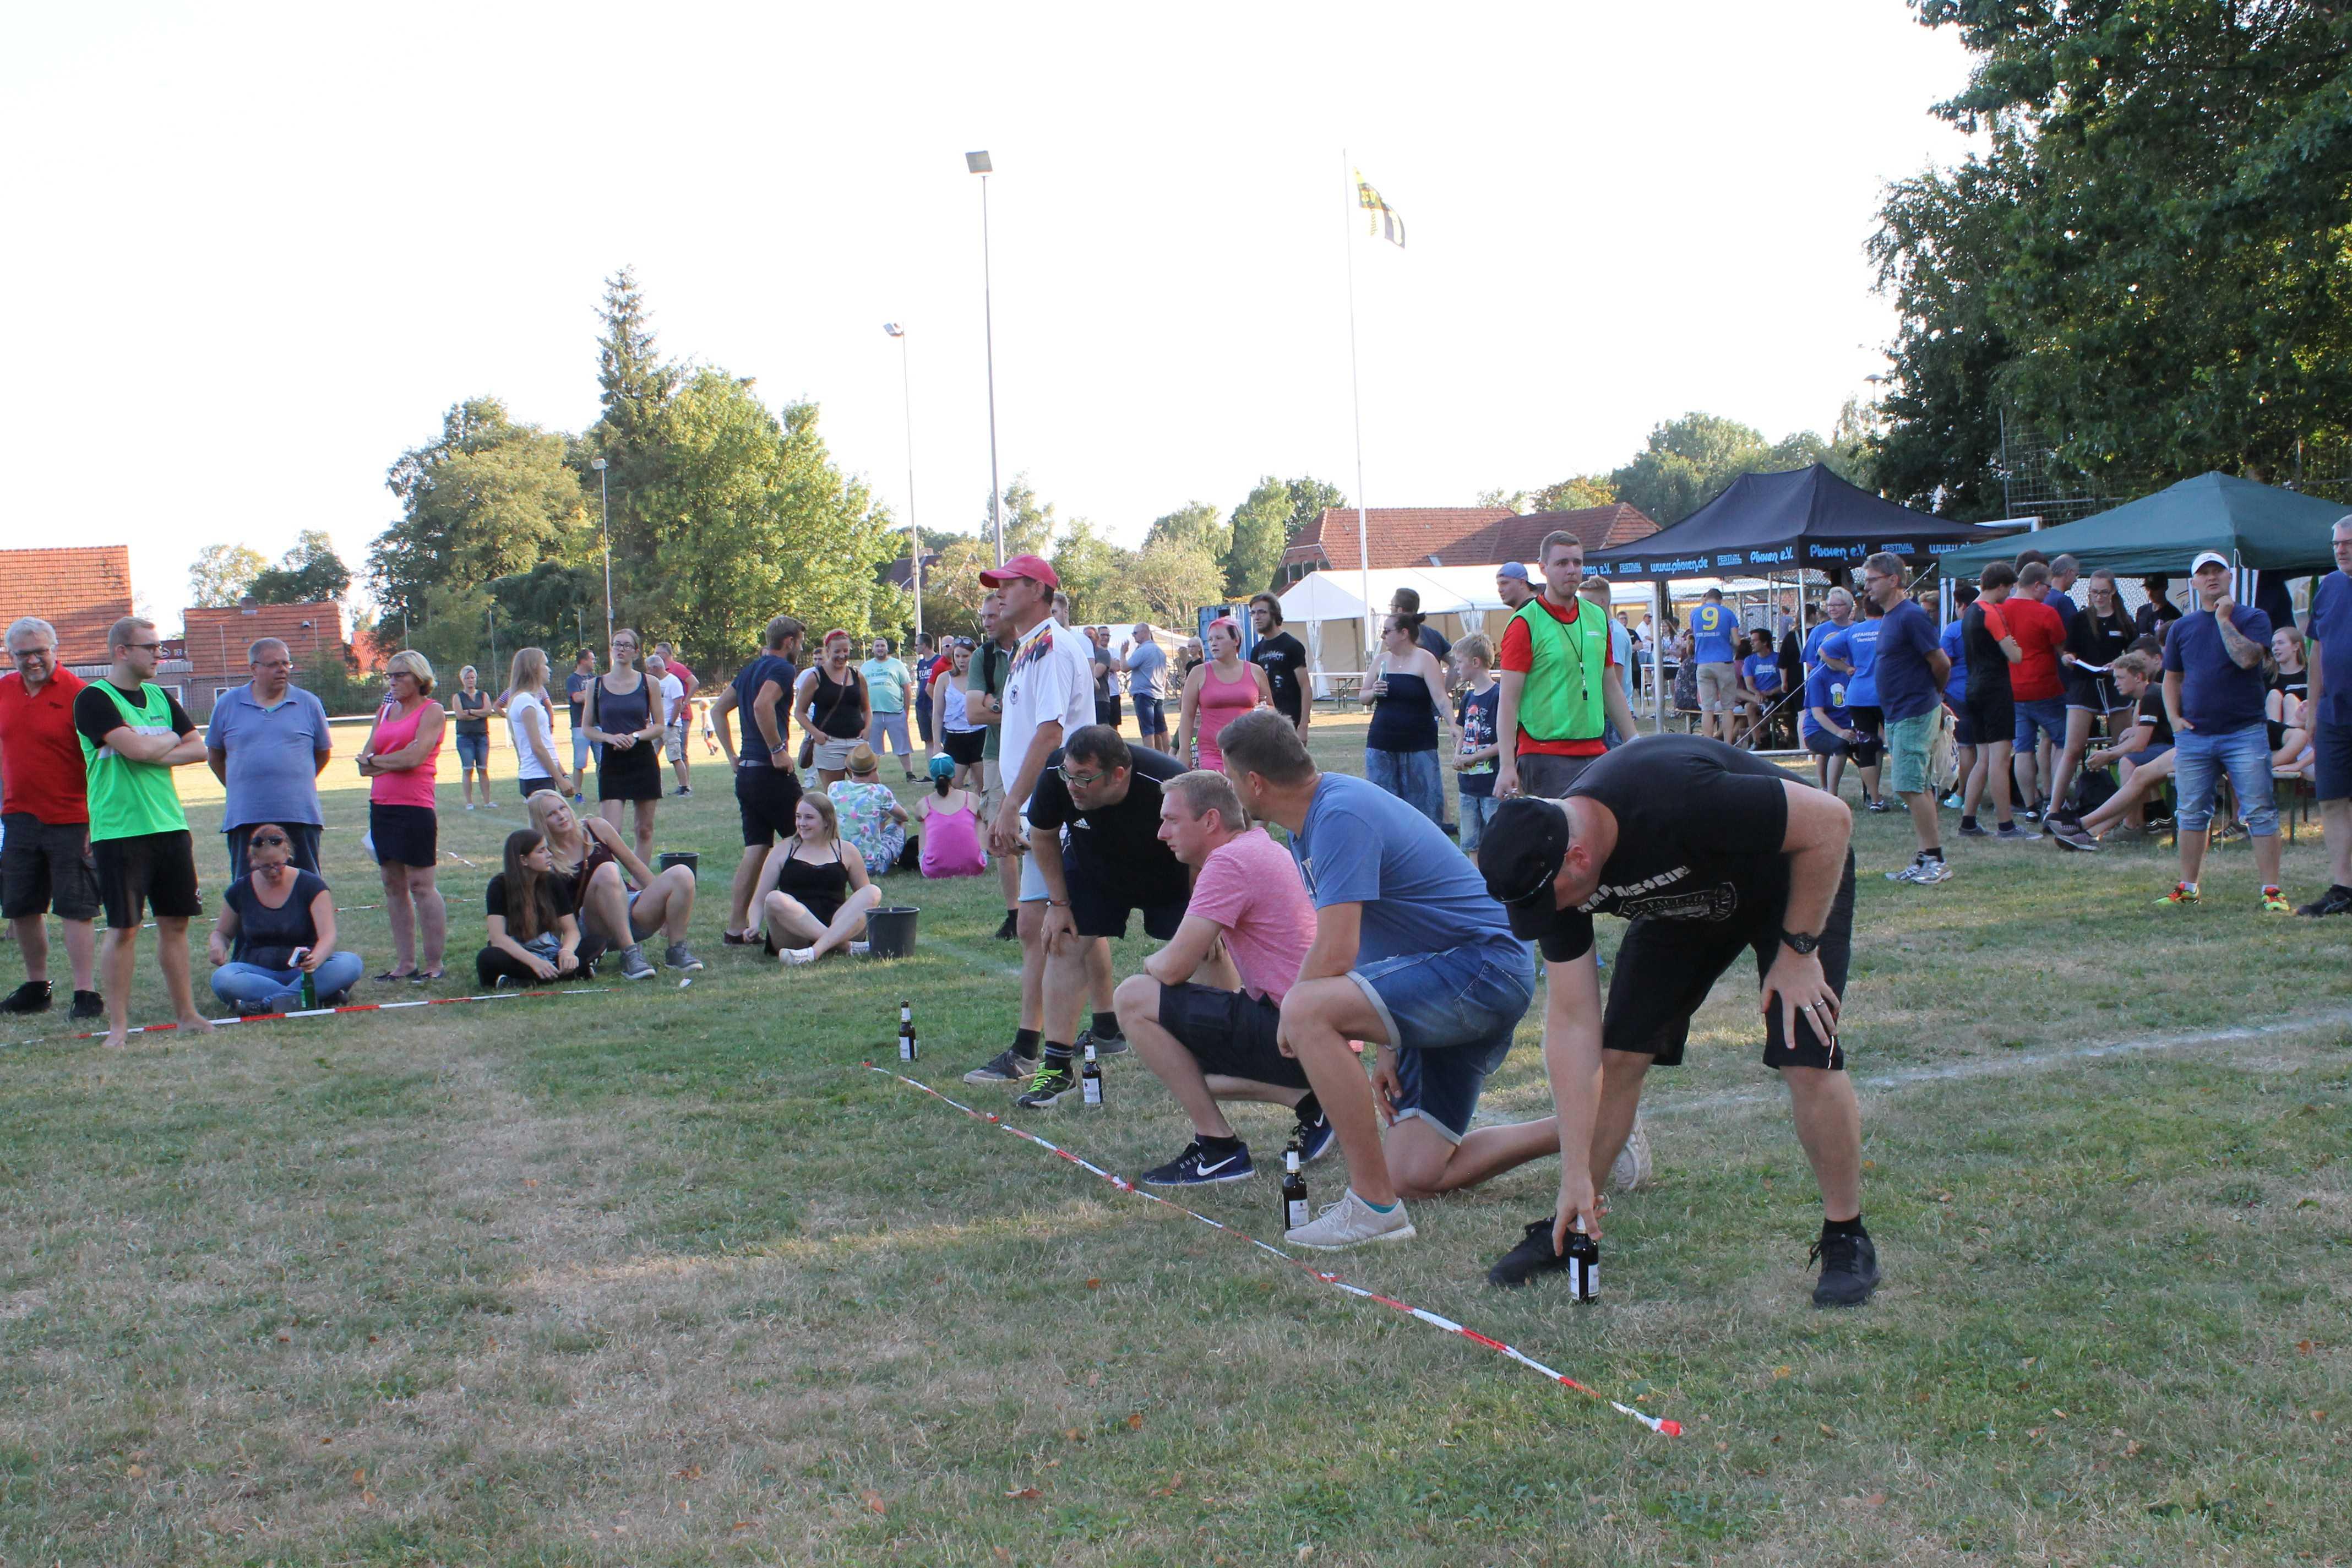 2018-07-27 Sportwoche - Flunkyball Turnier (27)